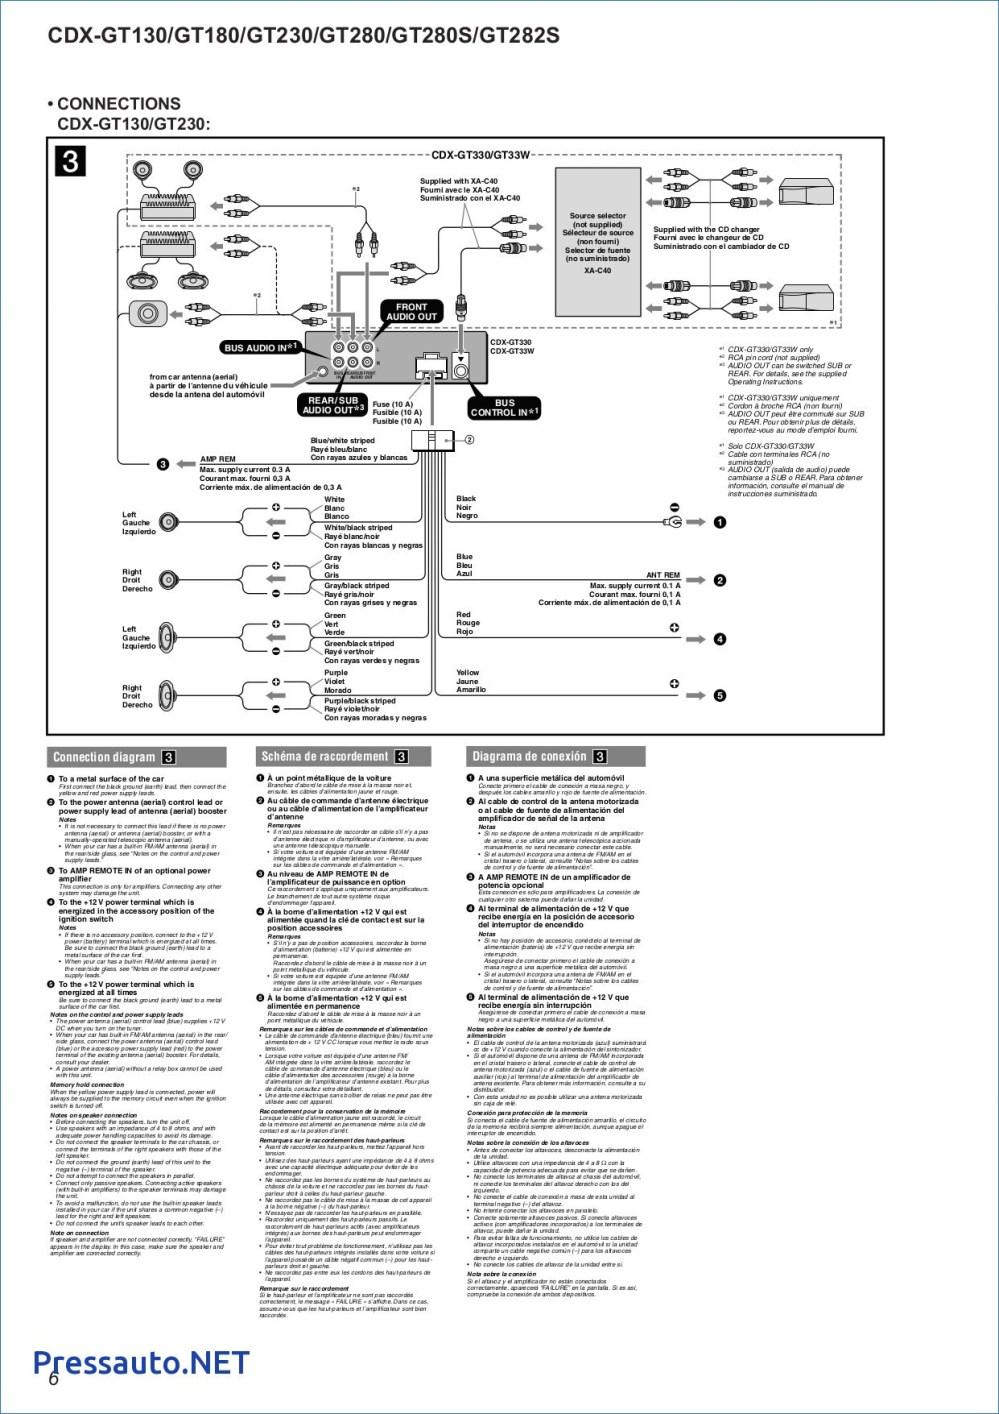 medium resolution of cdx wiring diagram for radio moreover sony xplod radio wiring rh sellfie co